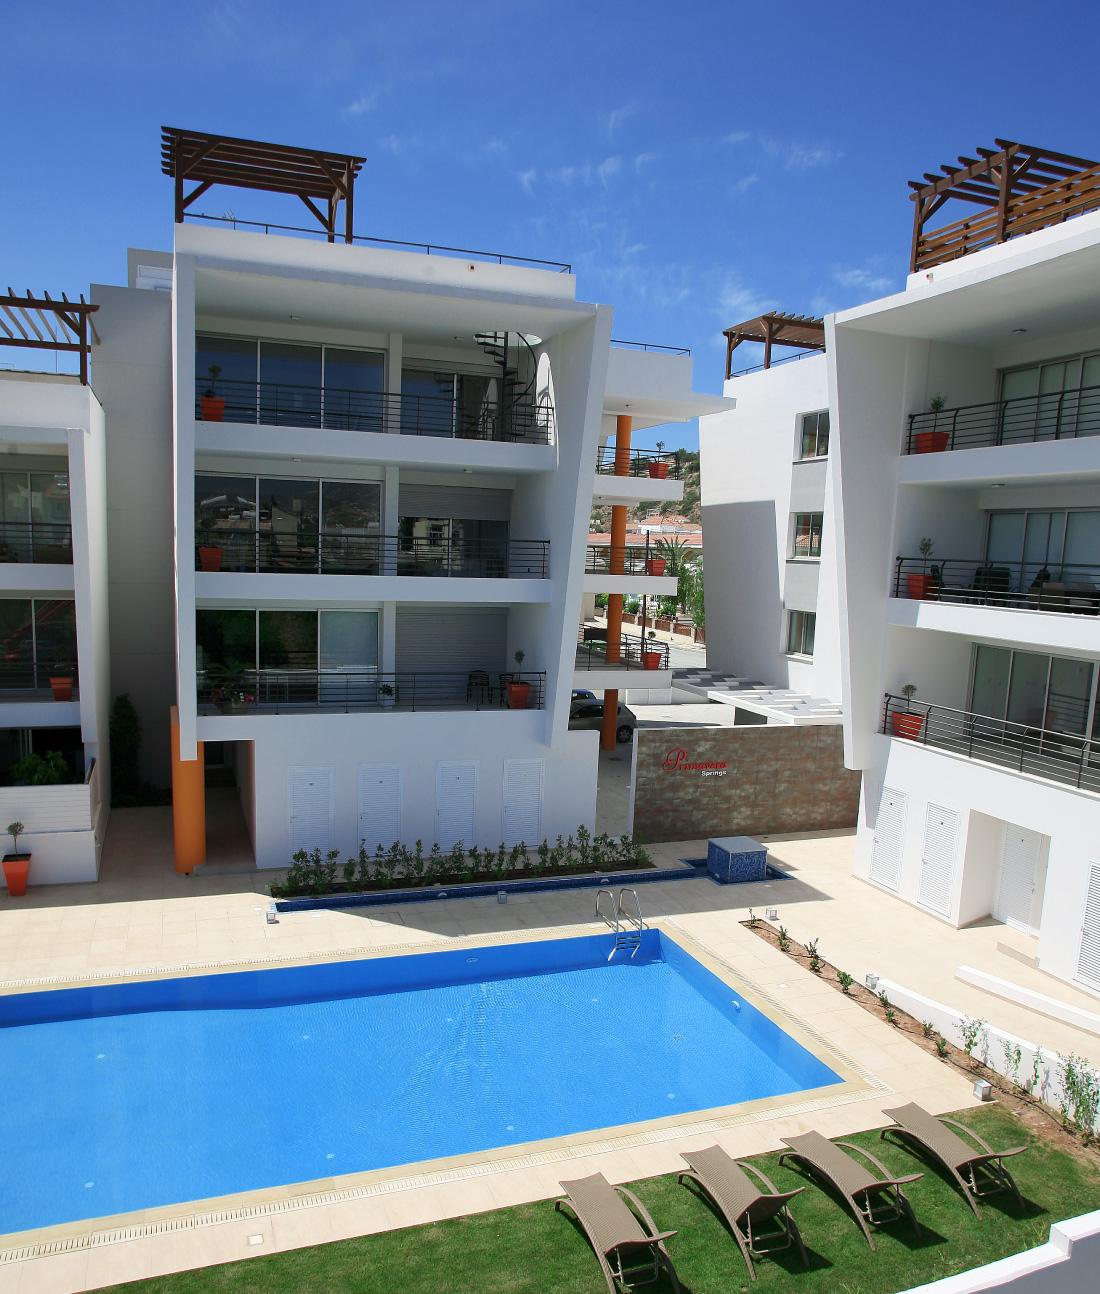 primavera, primaverasprins, apartments, residences, imperio, imperioproperties, limassol, cyprus, cyprusproperties